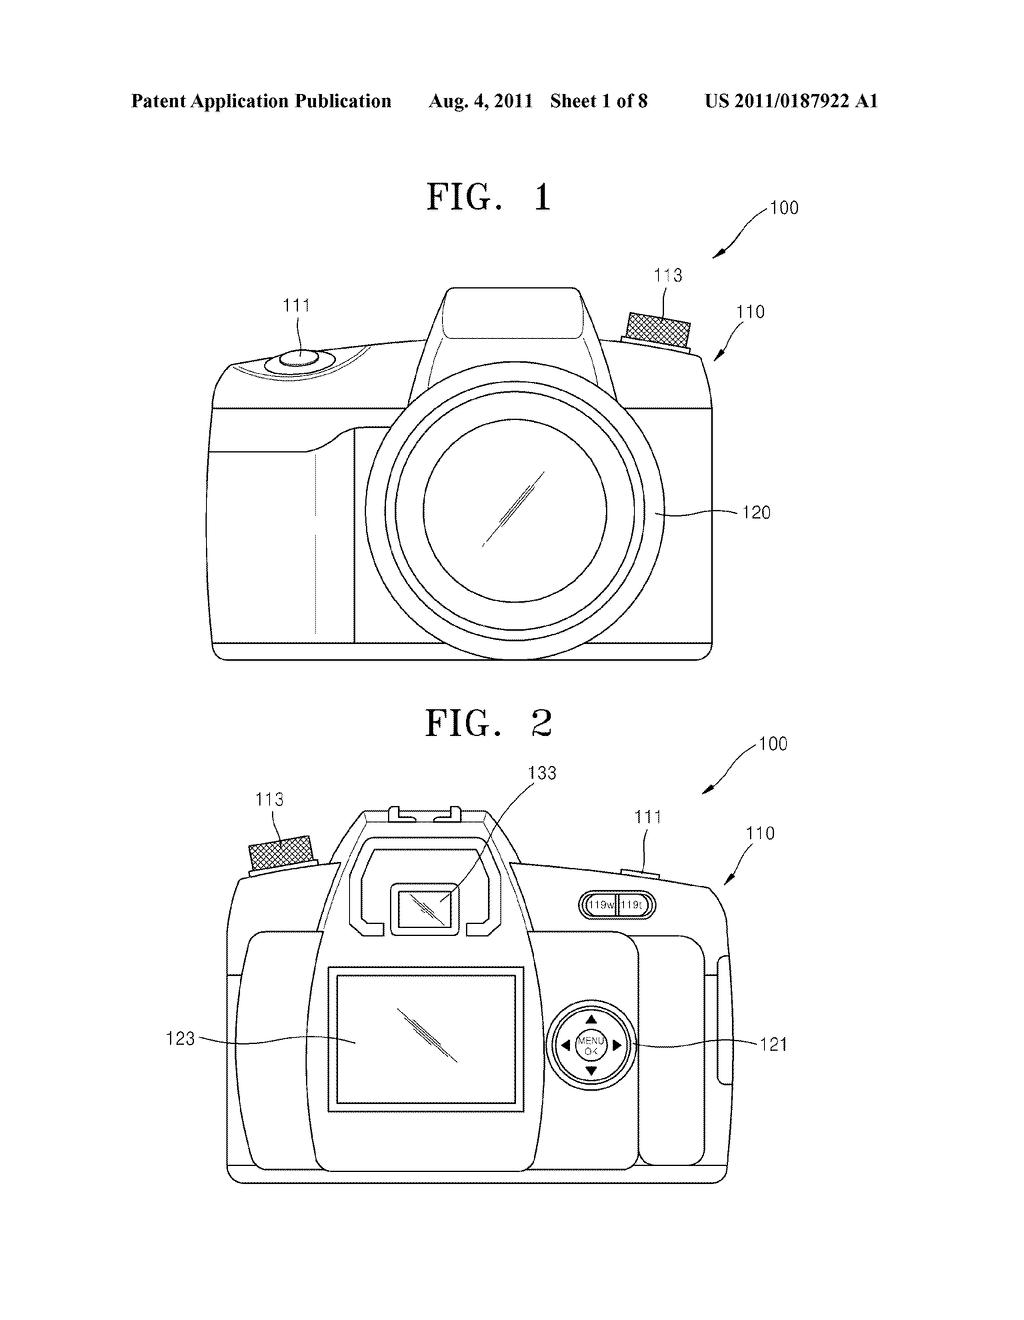 Digital single lens reflex camera diagram schematic and image 02 pooptronica